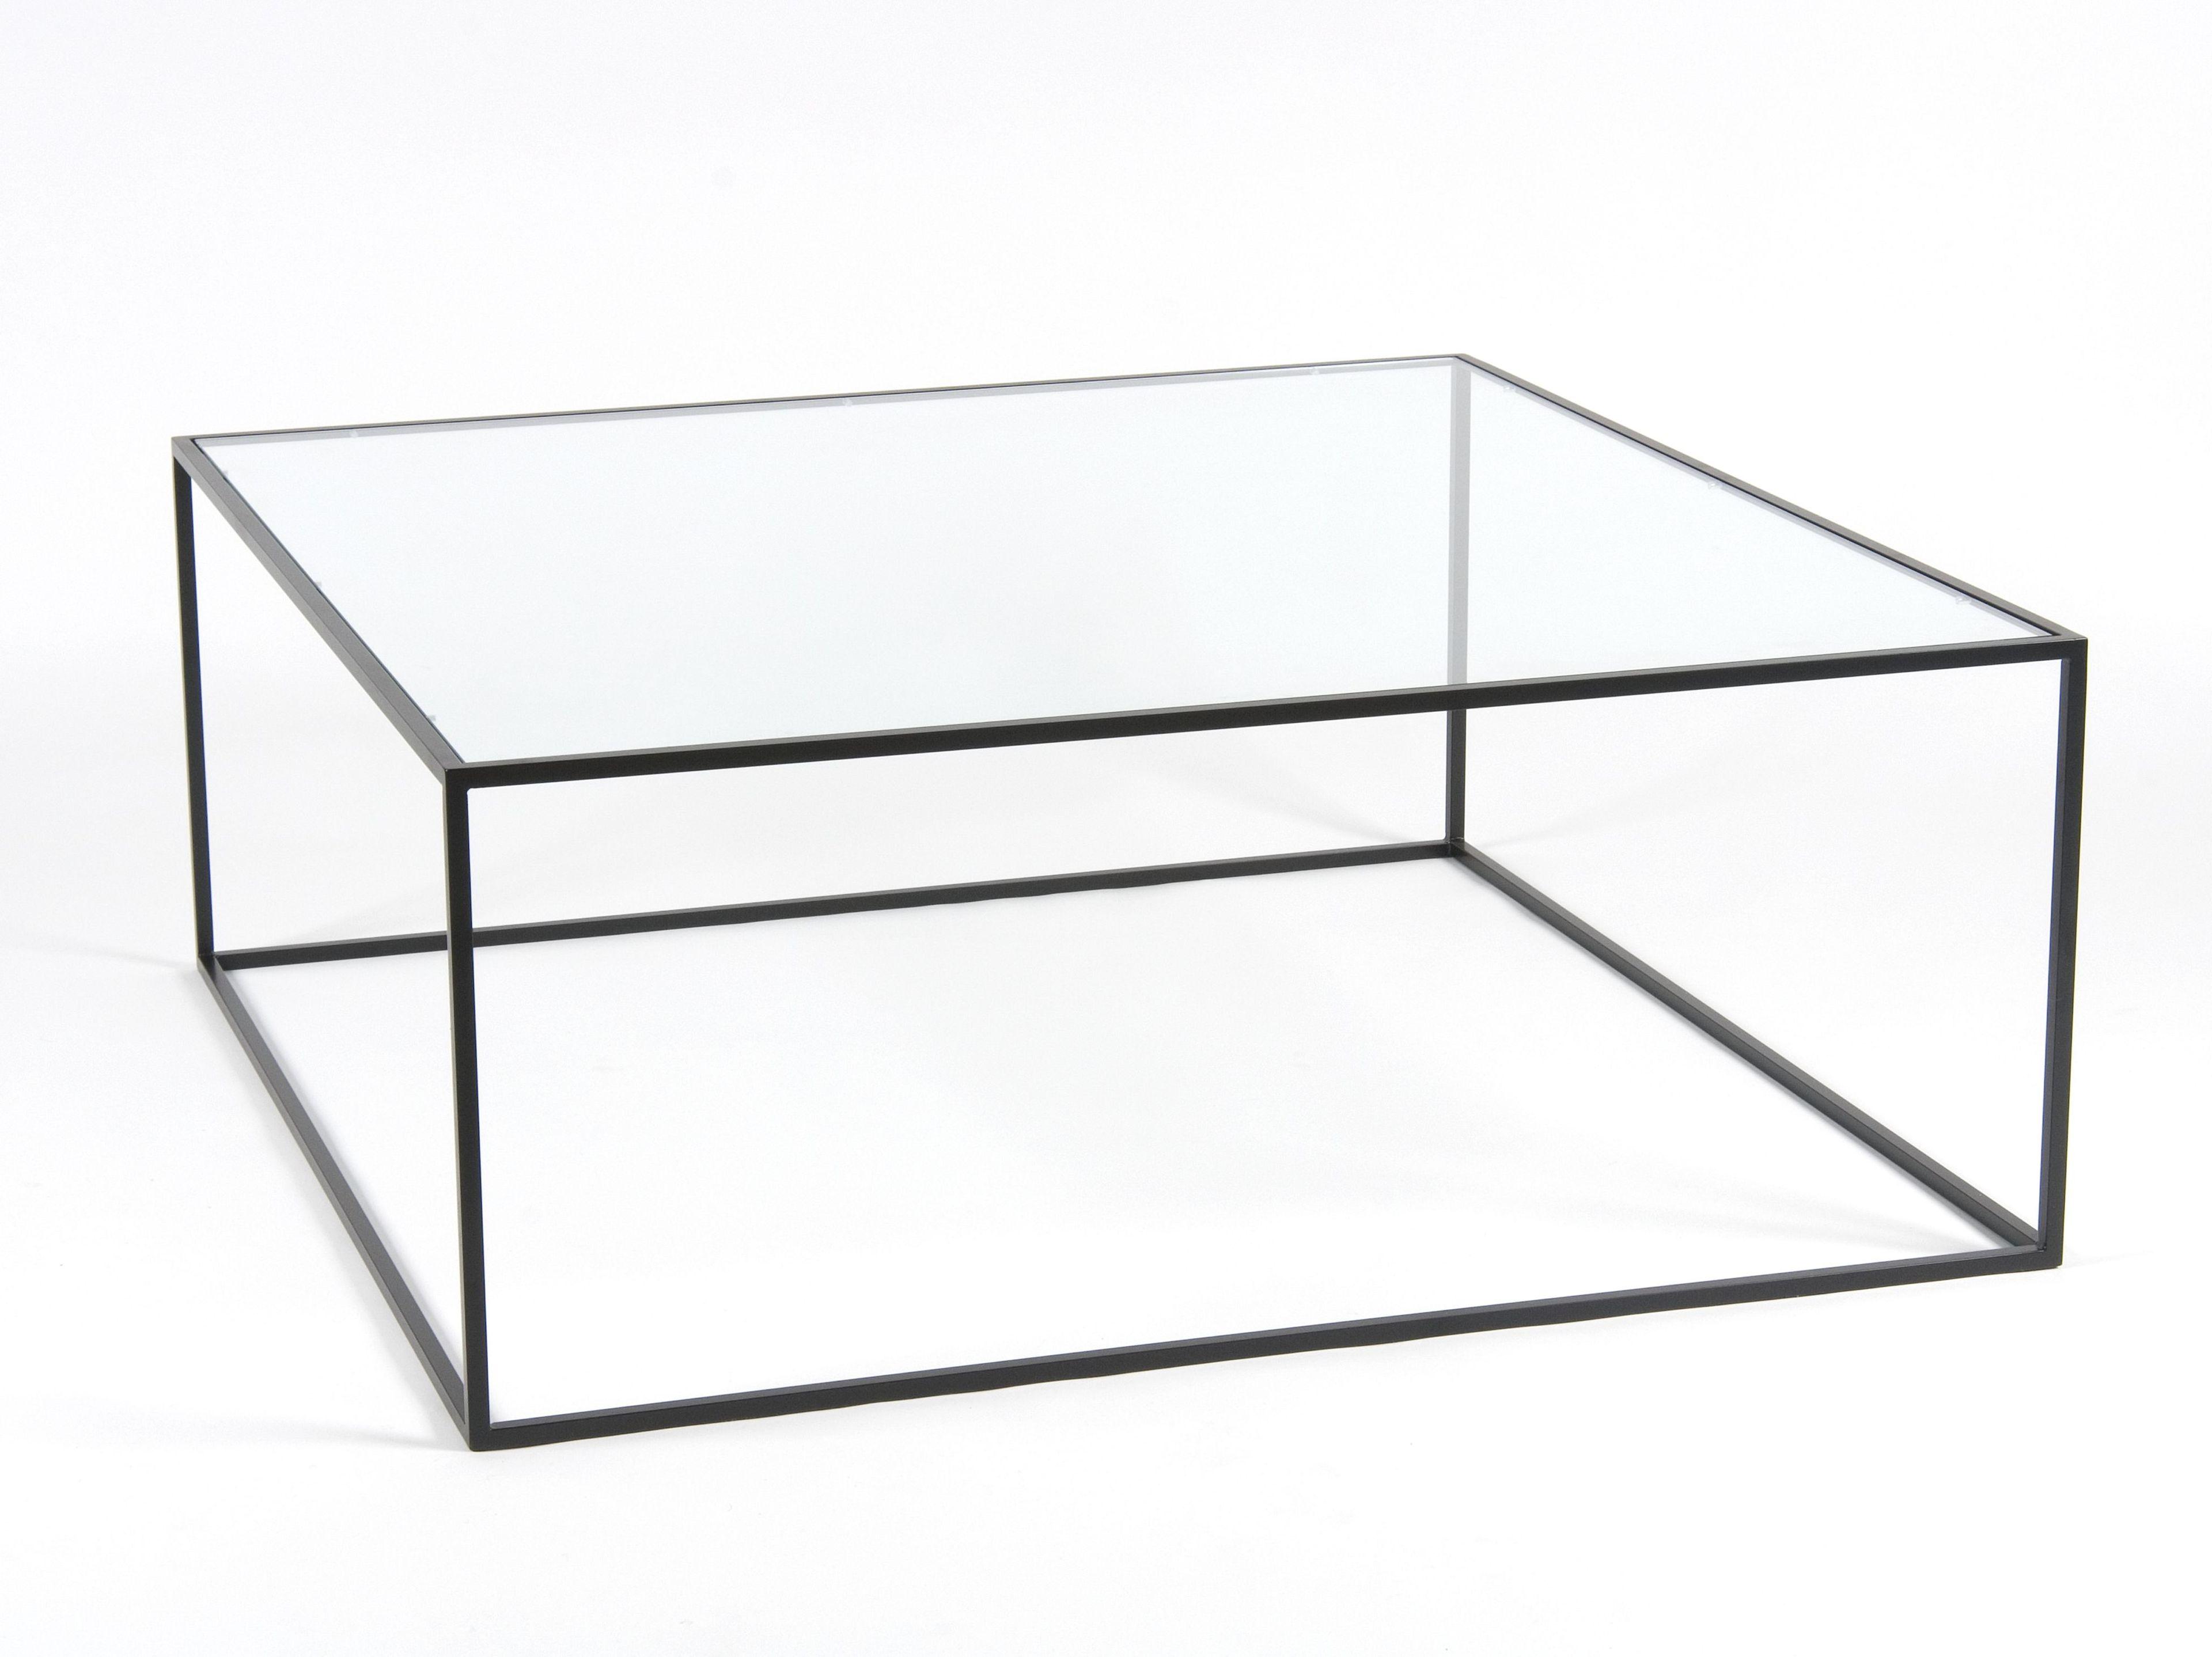 couchtisch eckig metall 18493420170804. Black Bedroom Furniture Sets. Home Design Ideas